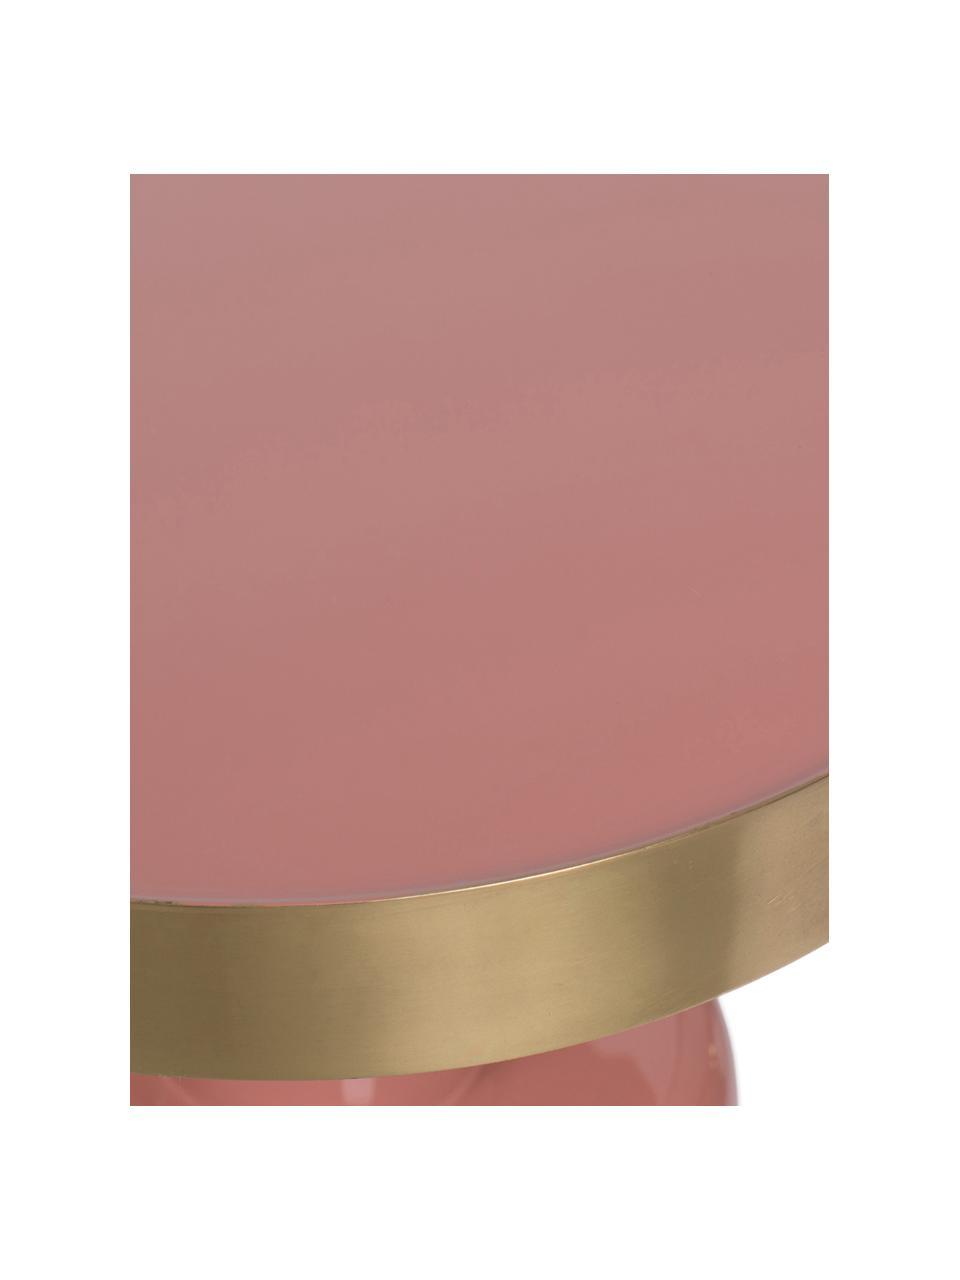 Table d'appoint émaillée Glam, Rose